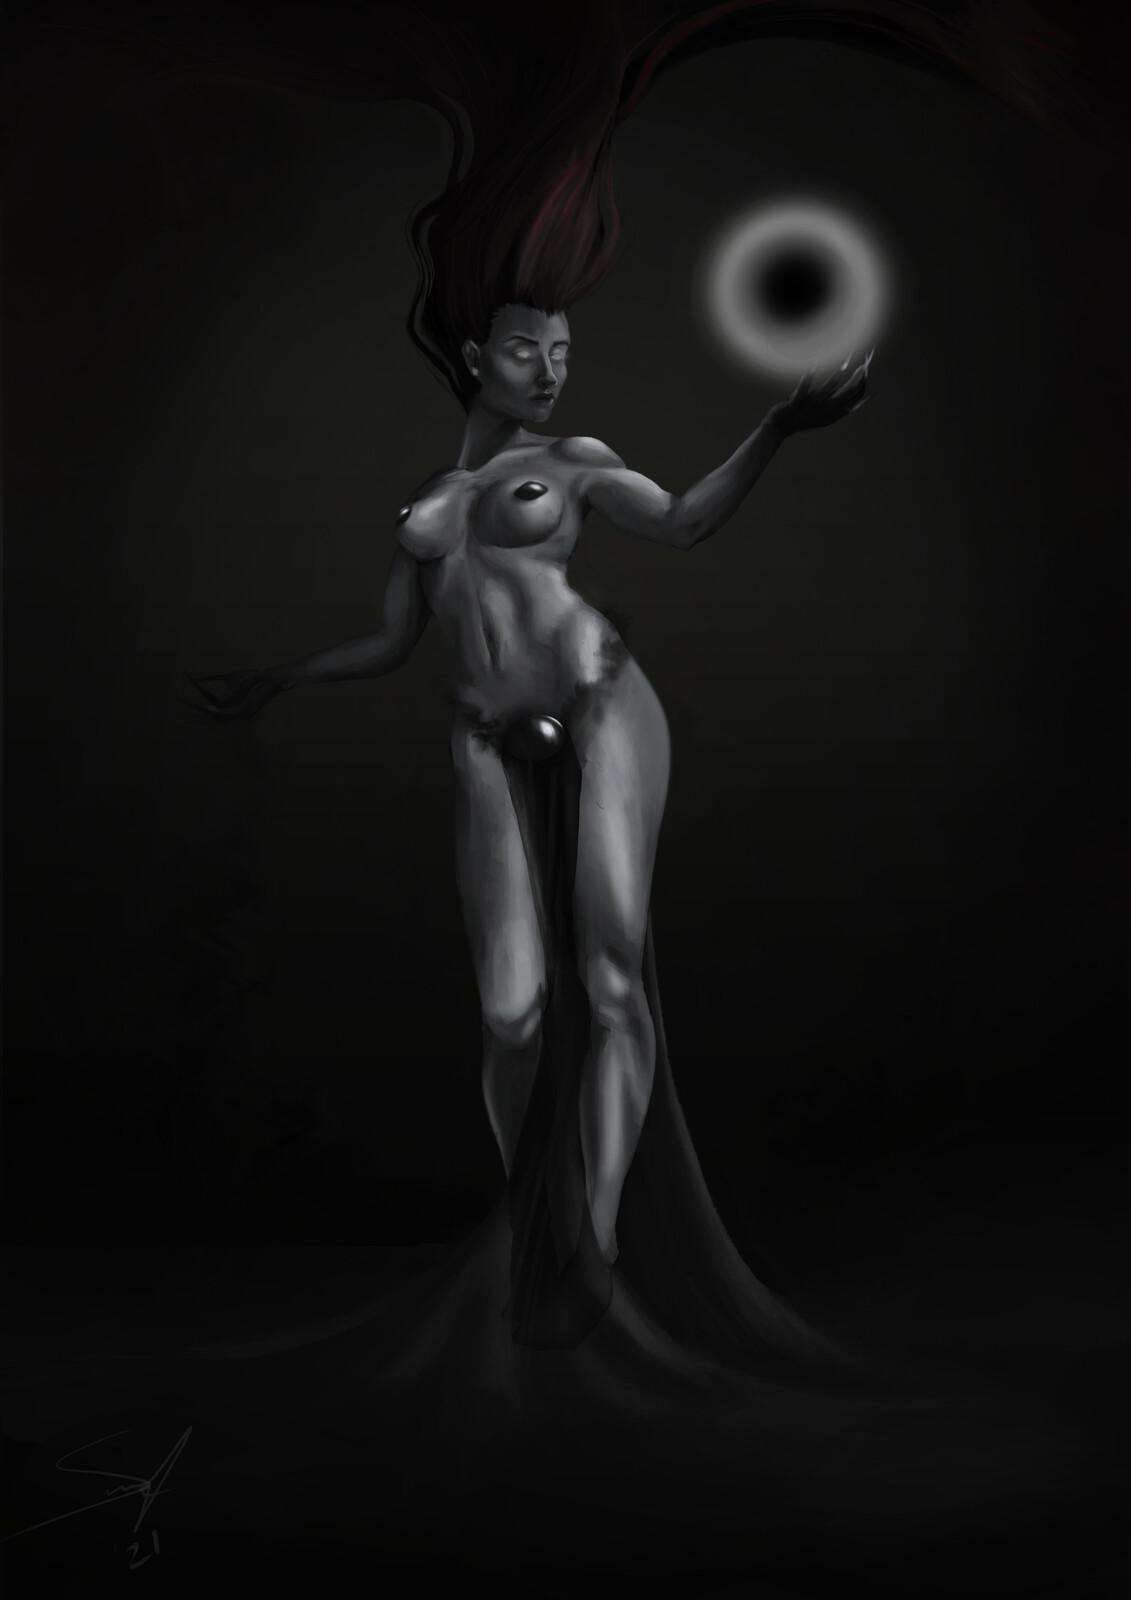 The Sorceress - Female Anatomy Art